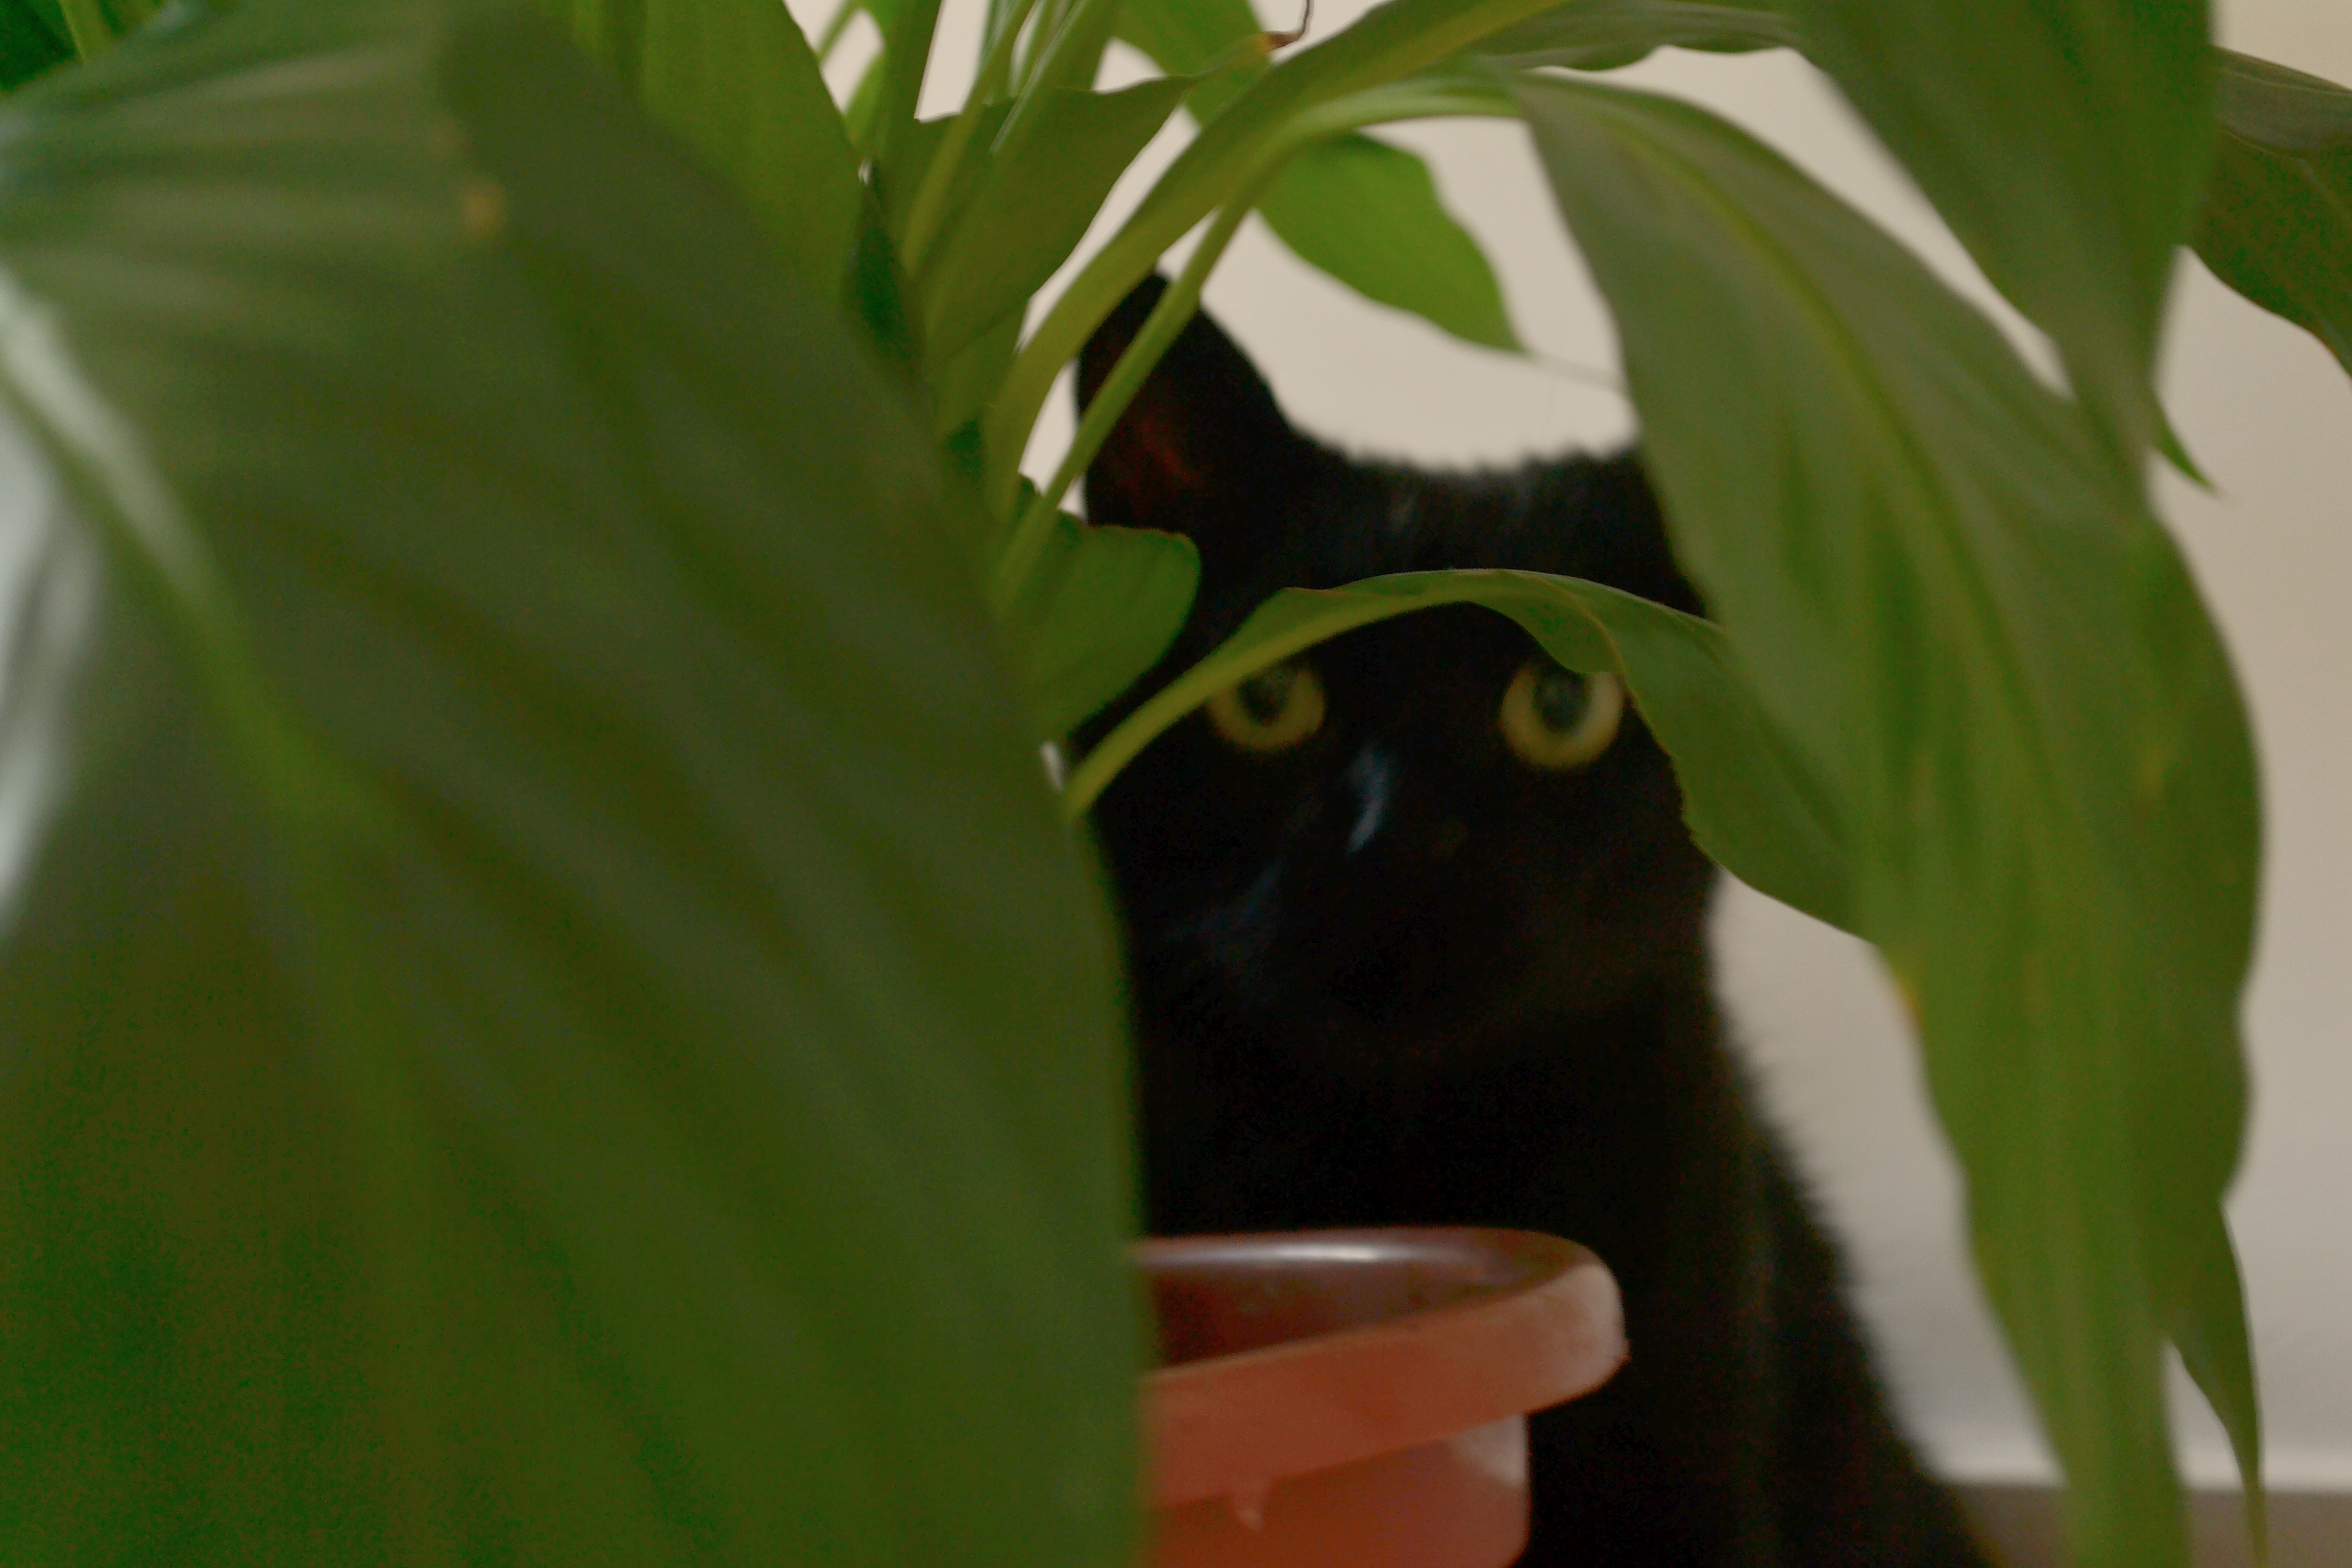 Jubi e a planta